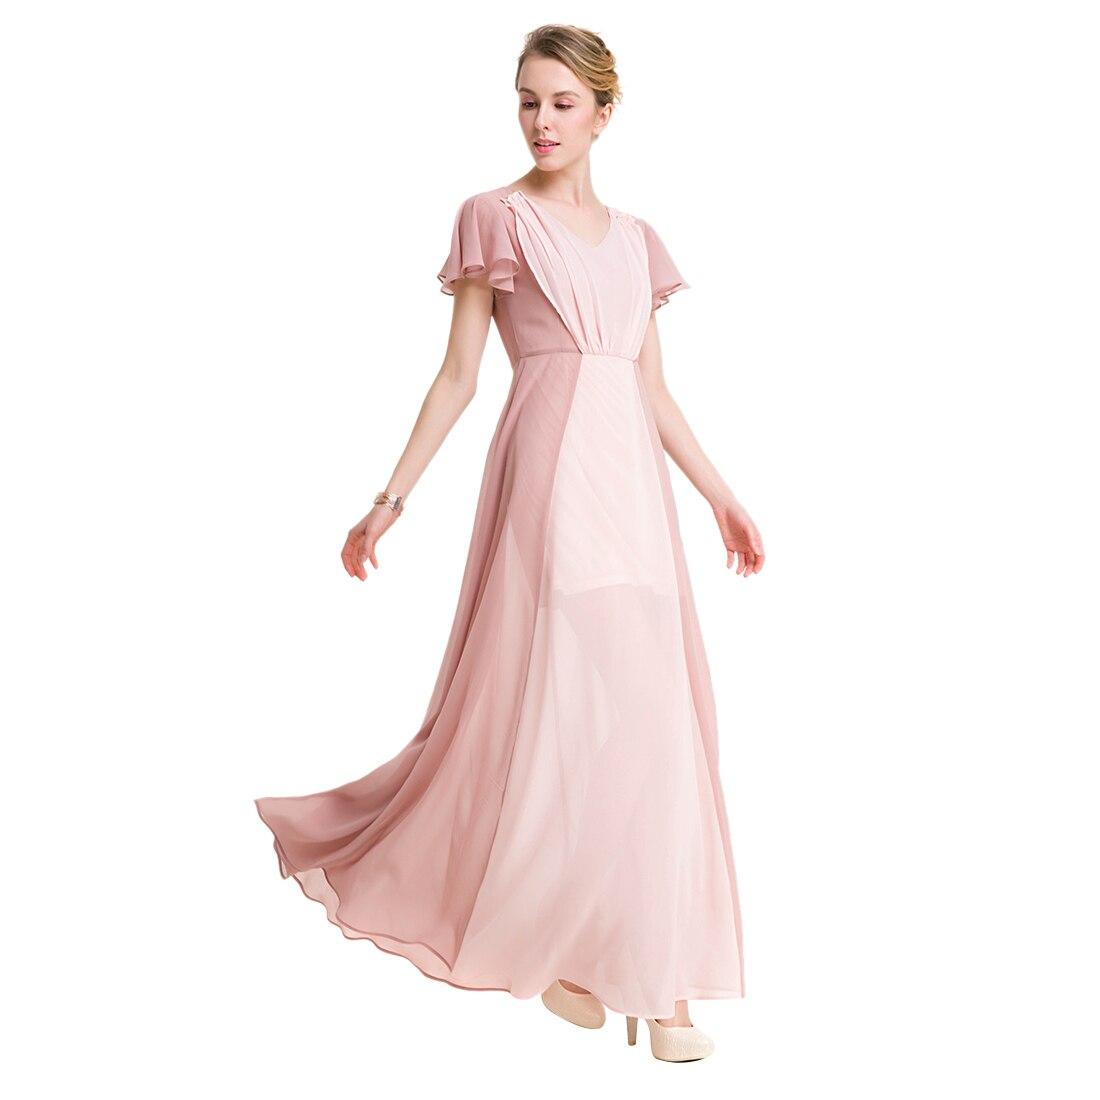 TFGS Original Design Women Long Chiffon Dress Patchwork Color Petal Sleeve V Neck Pleated Dress Casual